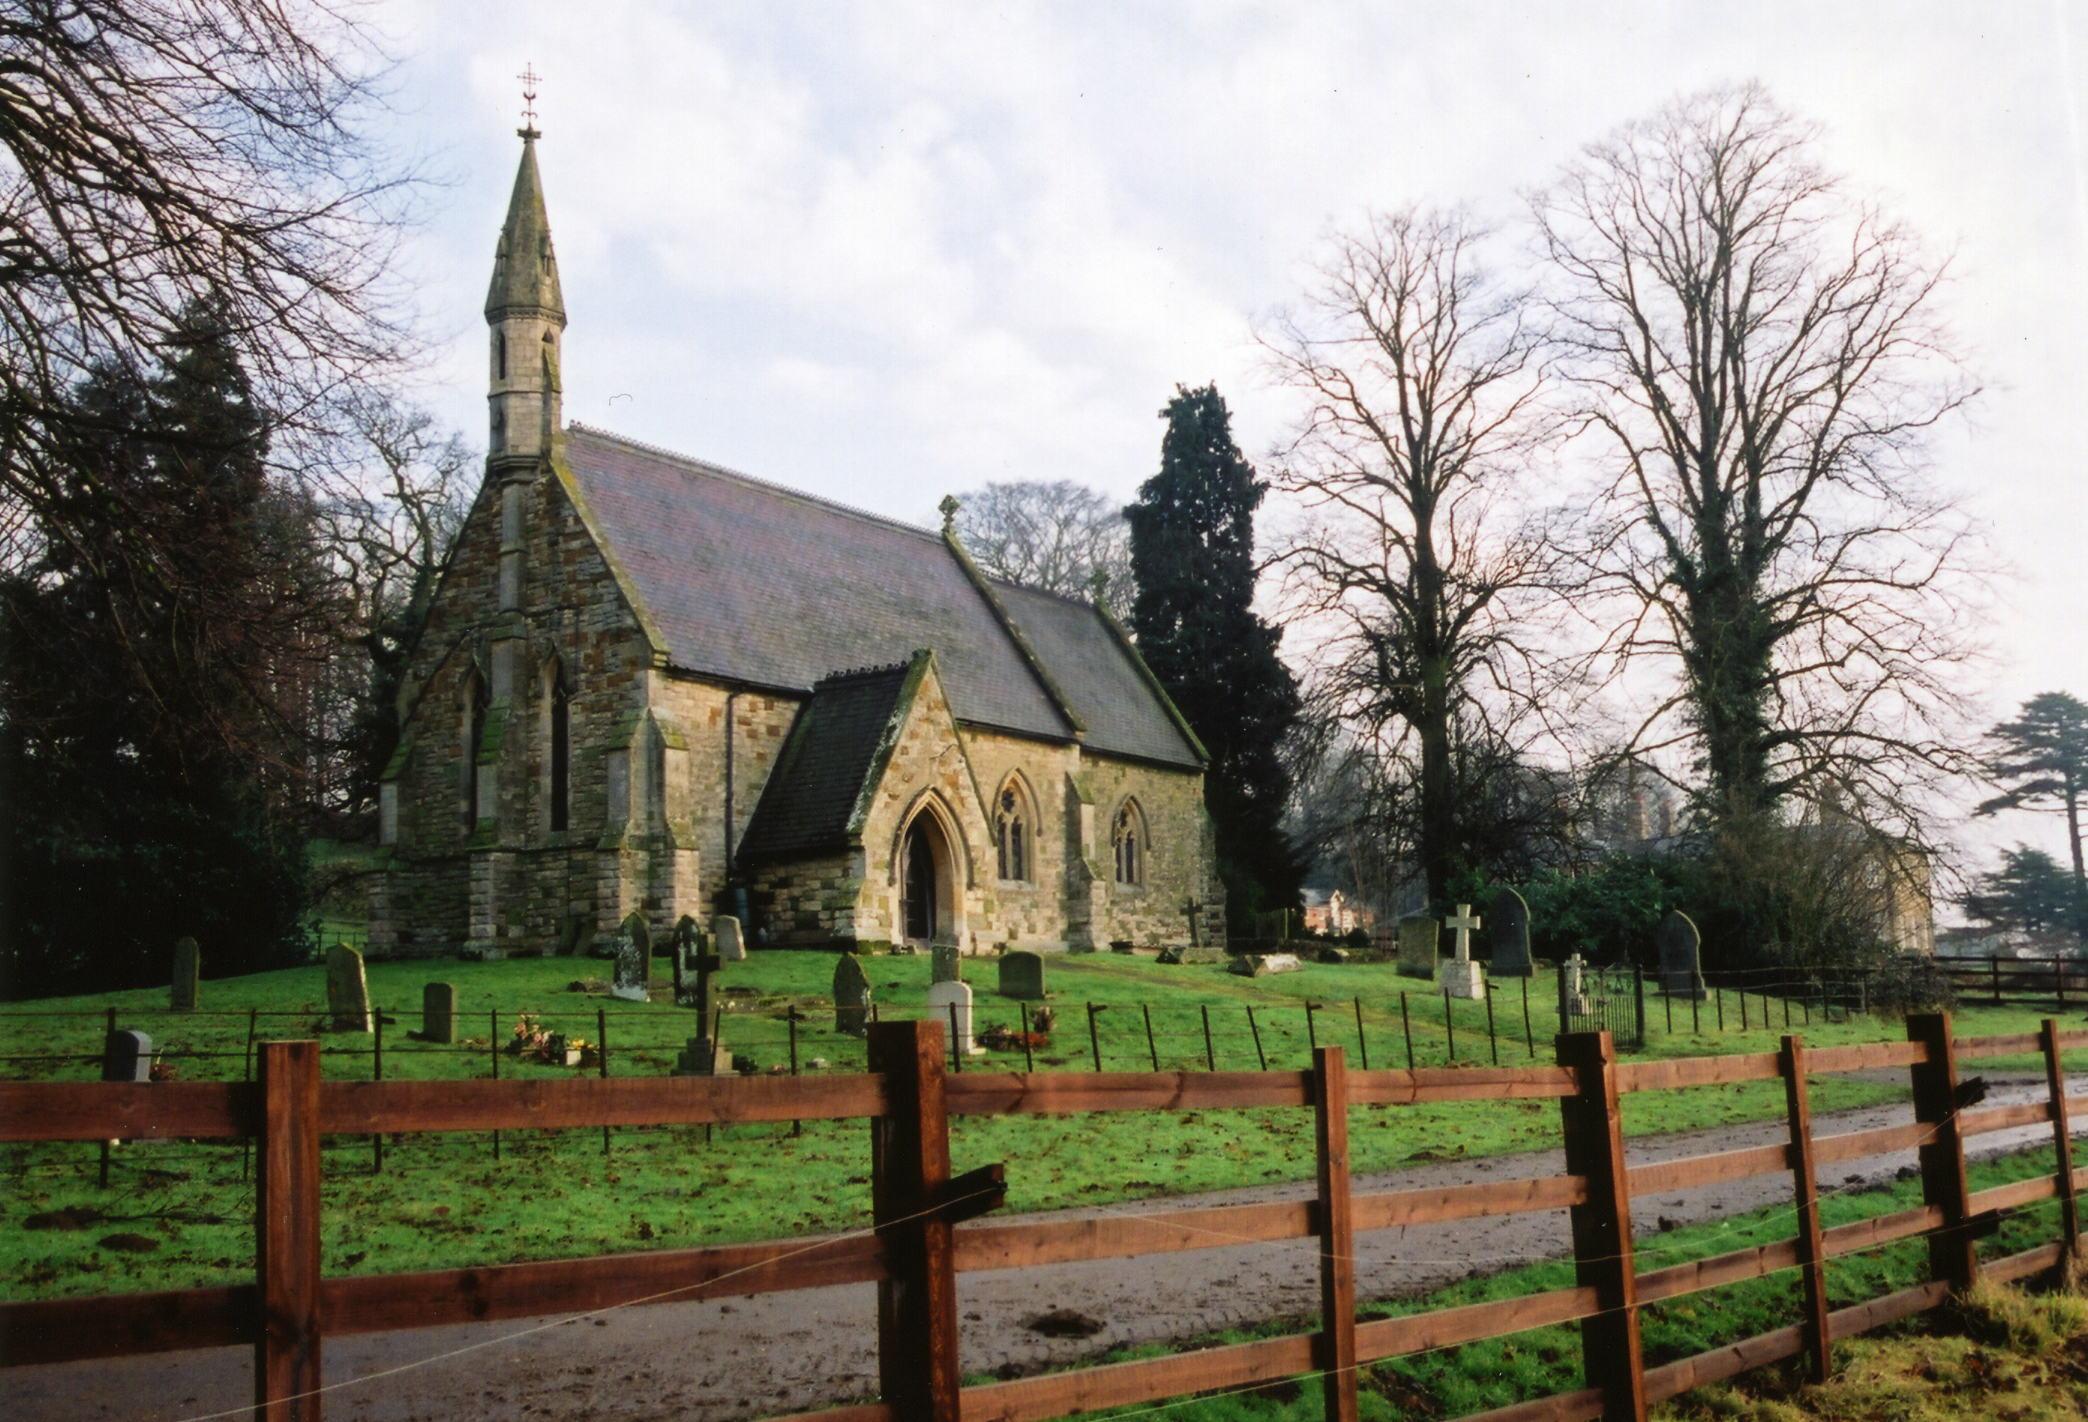 Dalby St. Lawrence parish church